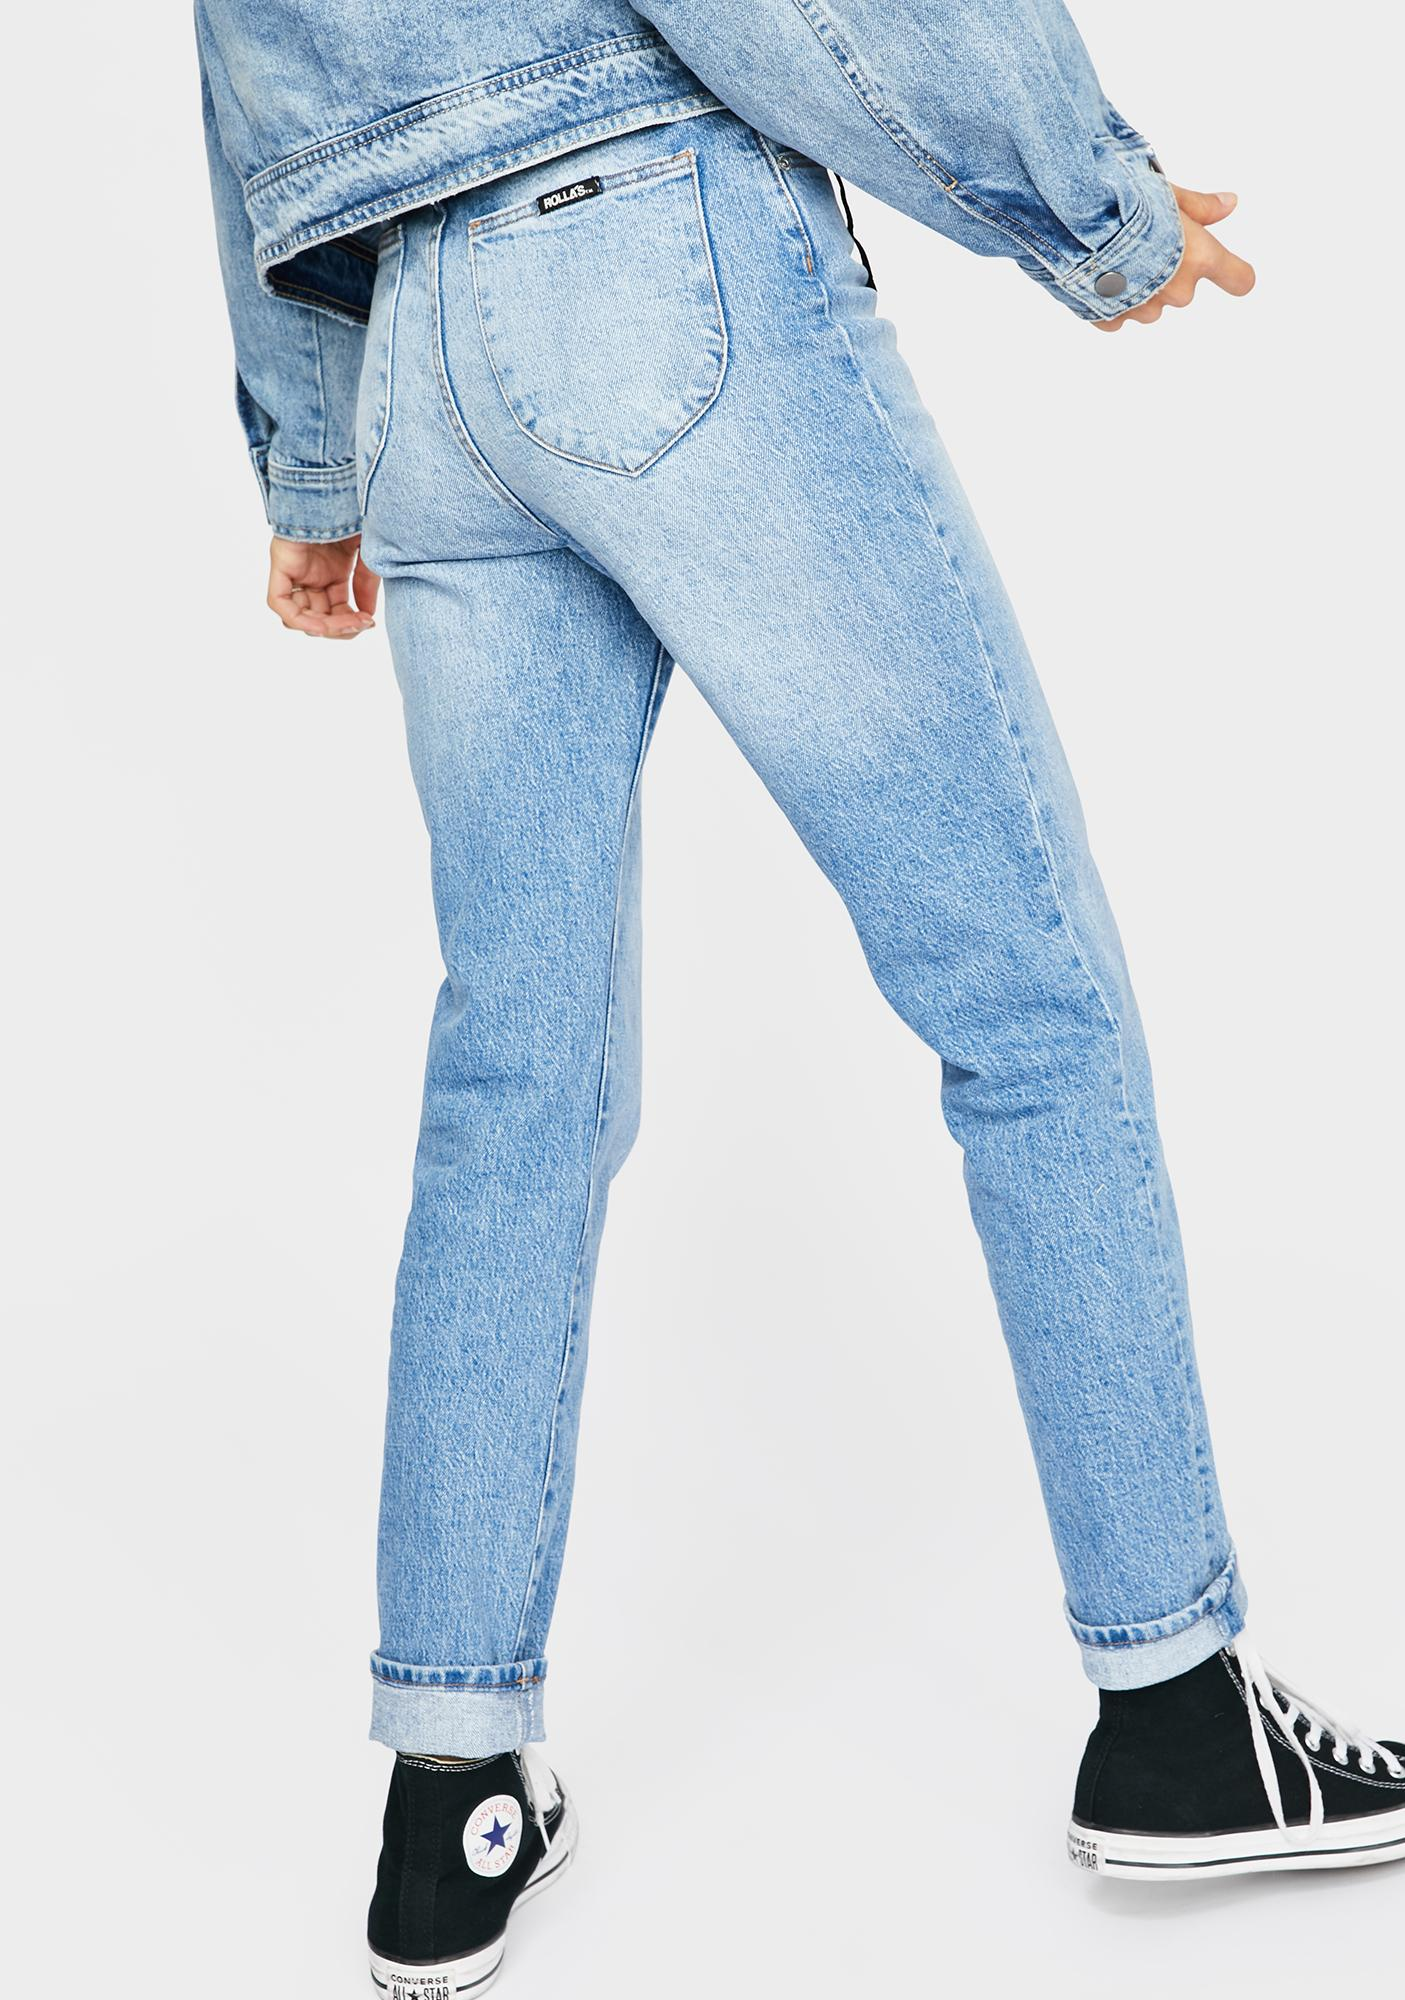 Rollas New Vintage Dusters Slim Straight